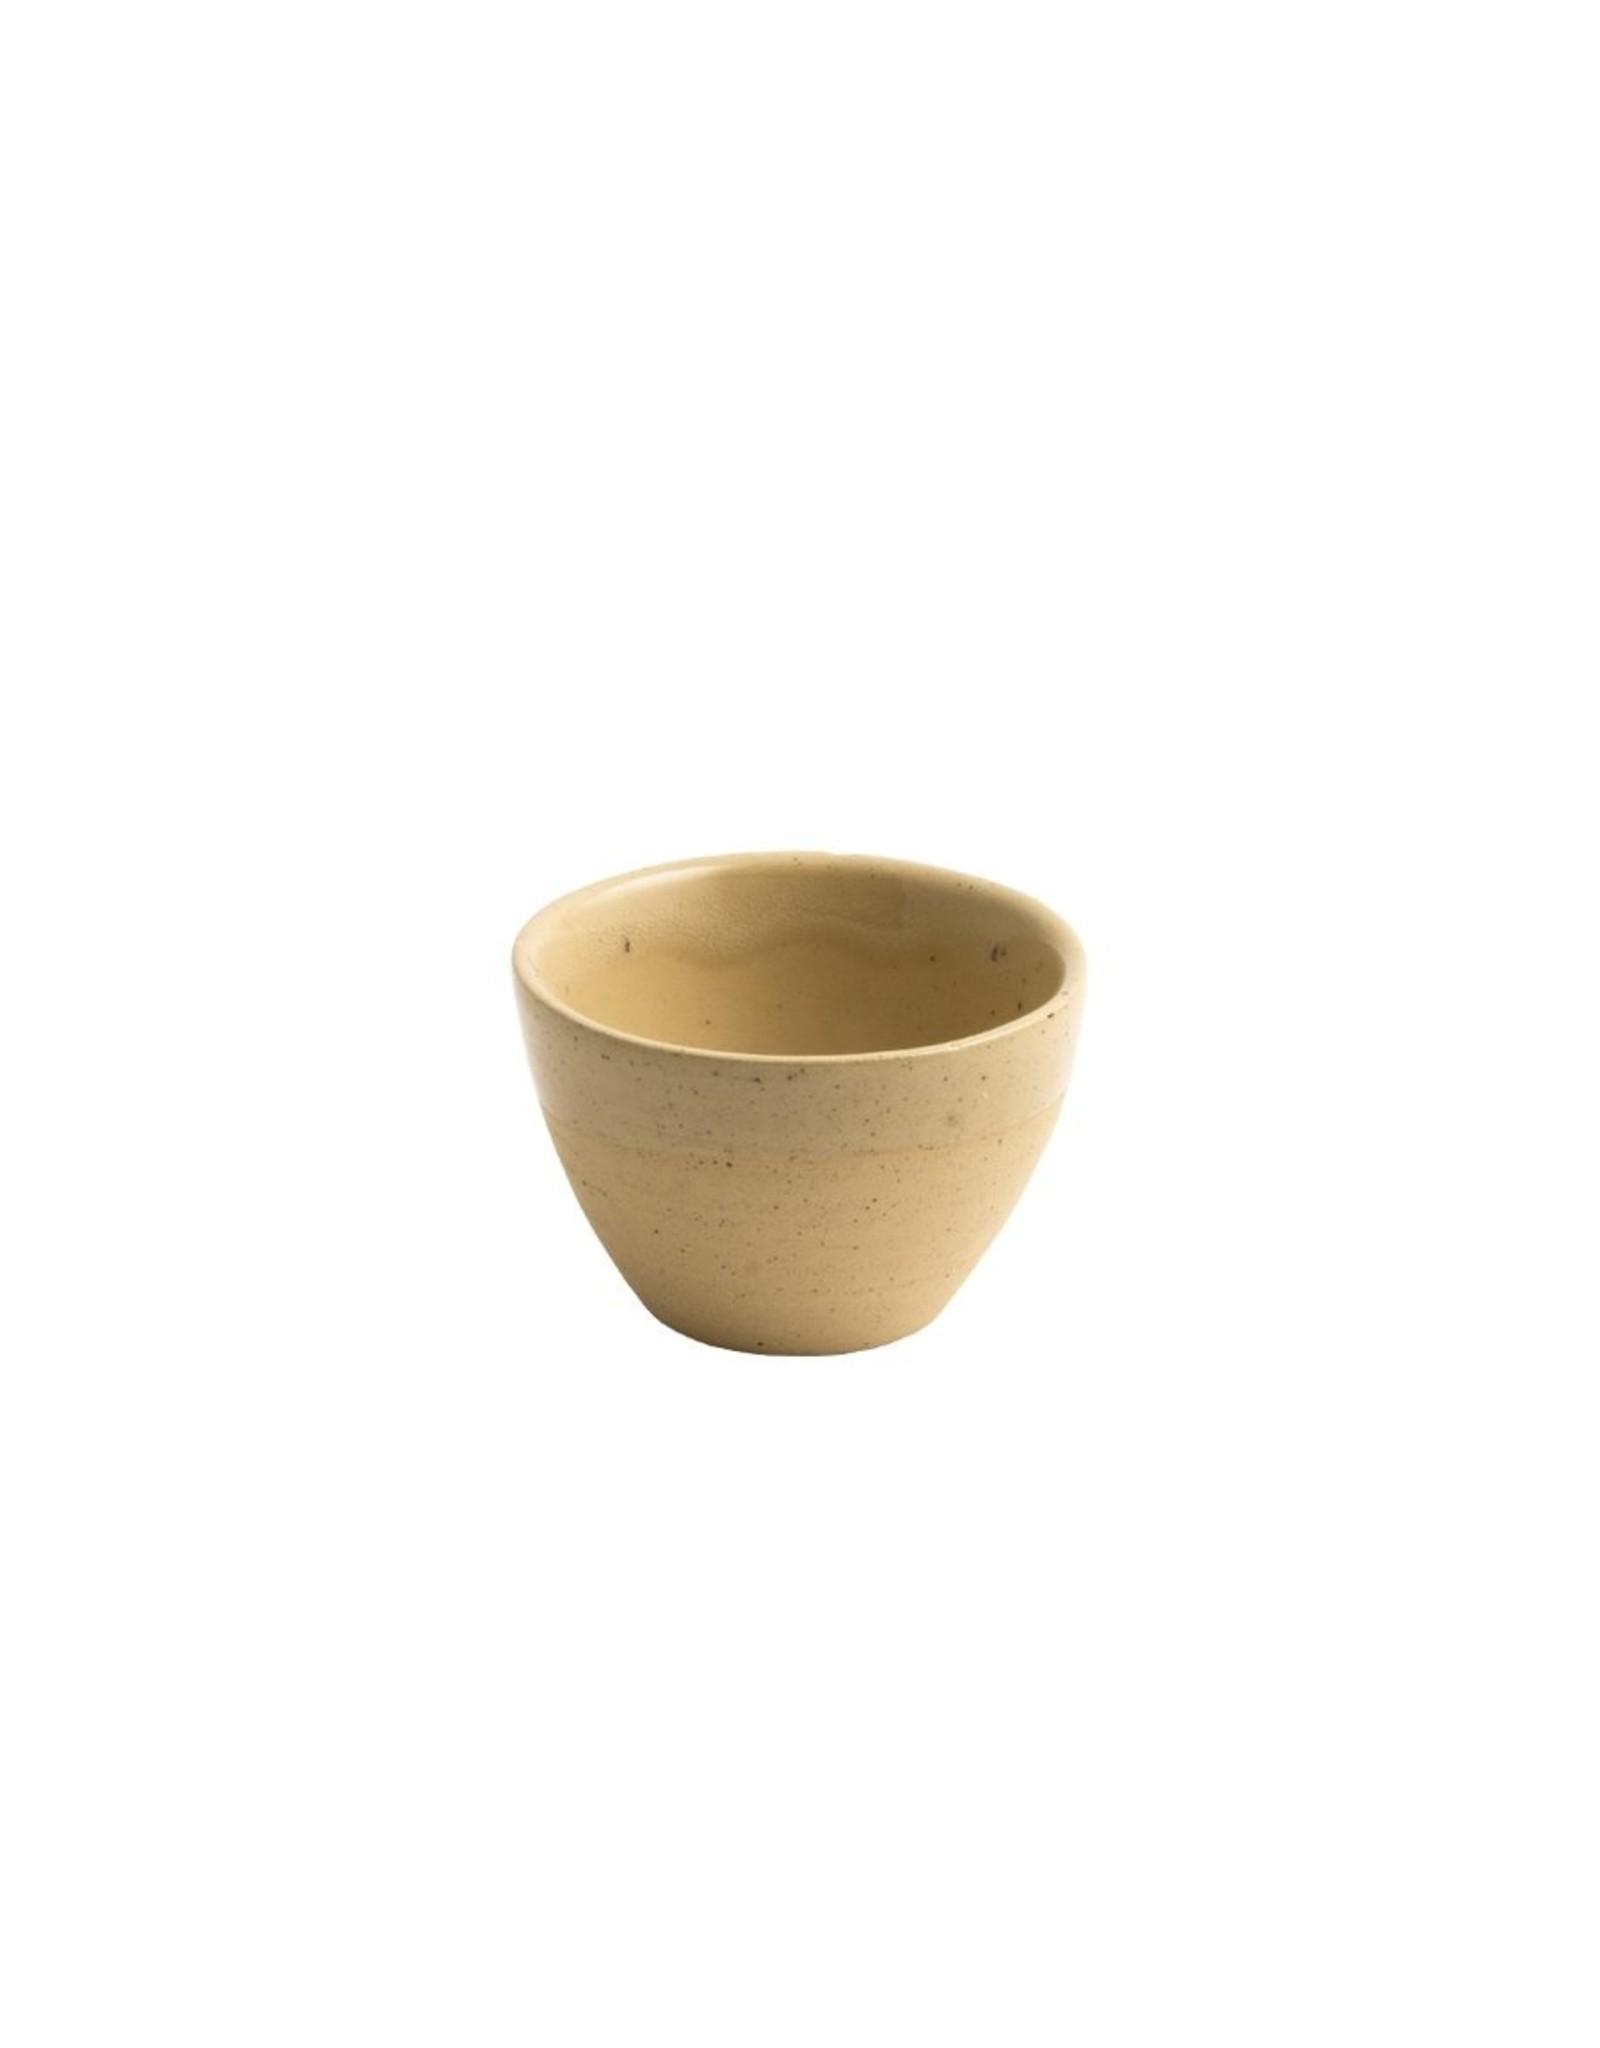 Yann cup M - Cream